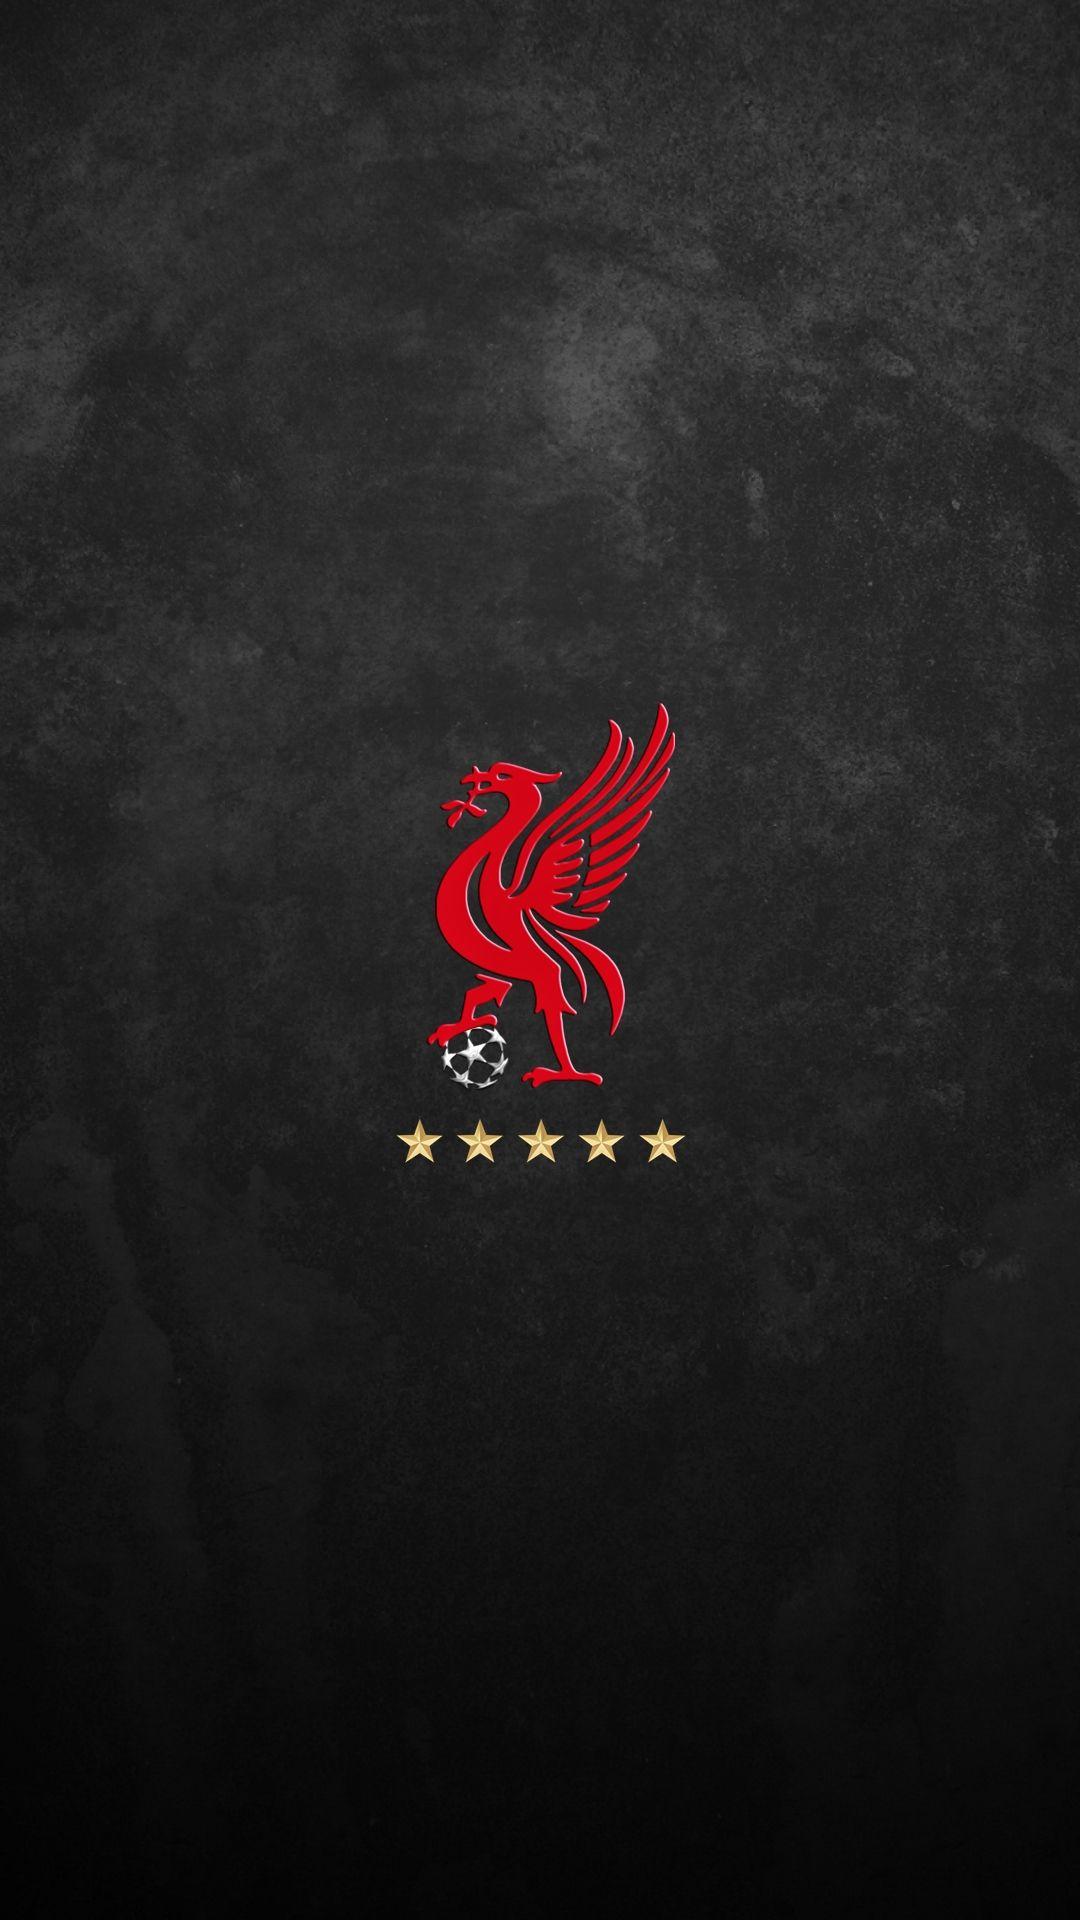 Liverpool Fc Wallpaper Champions